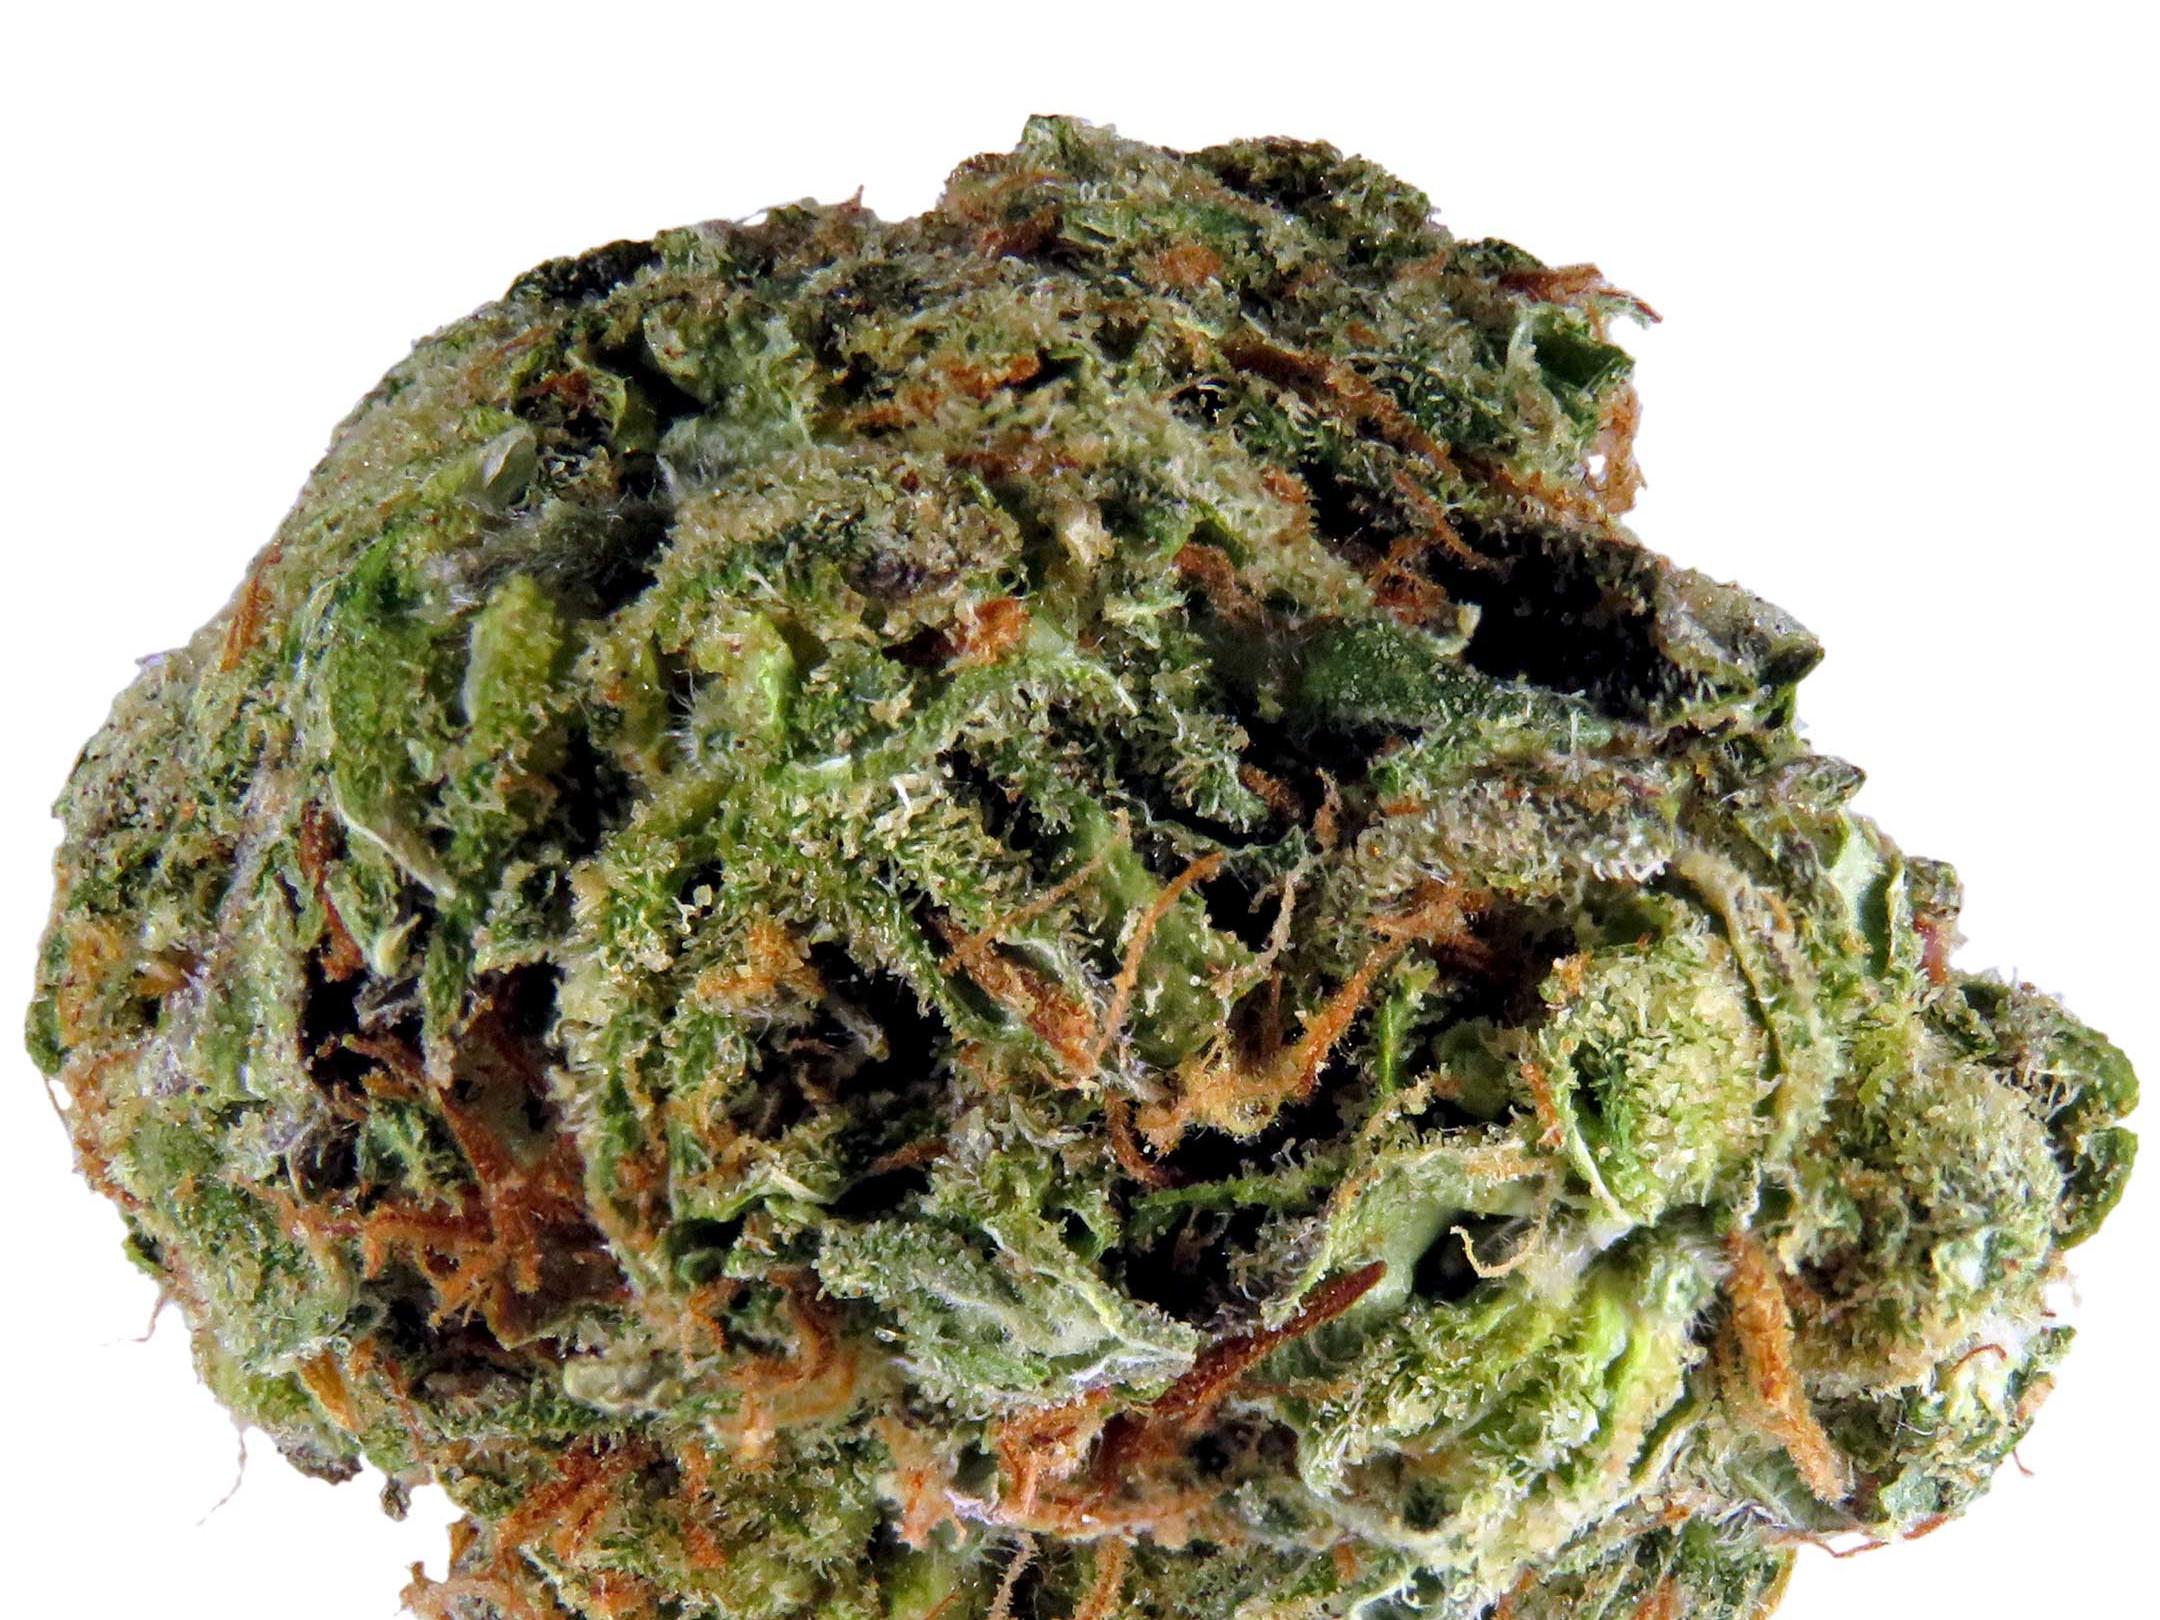 Citrus Skunk Marijuana Strain by Pure 710